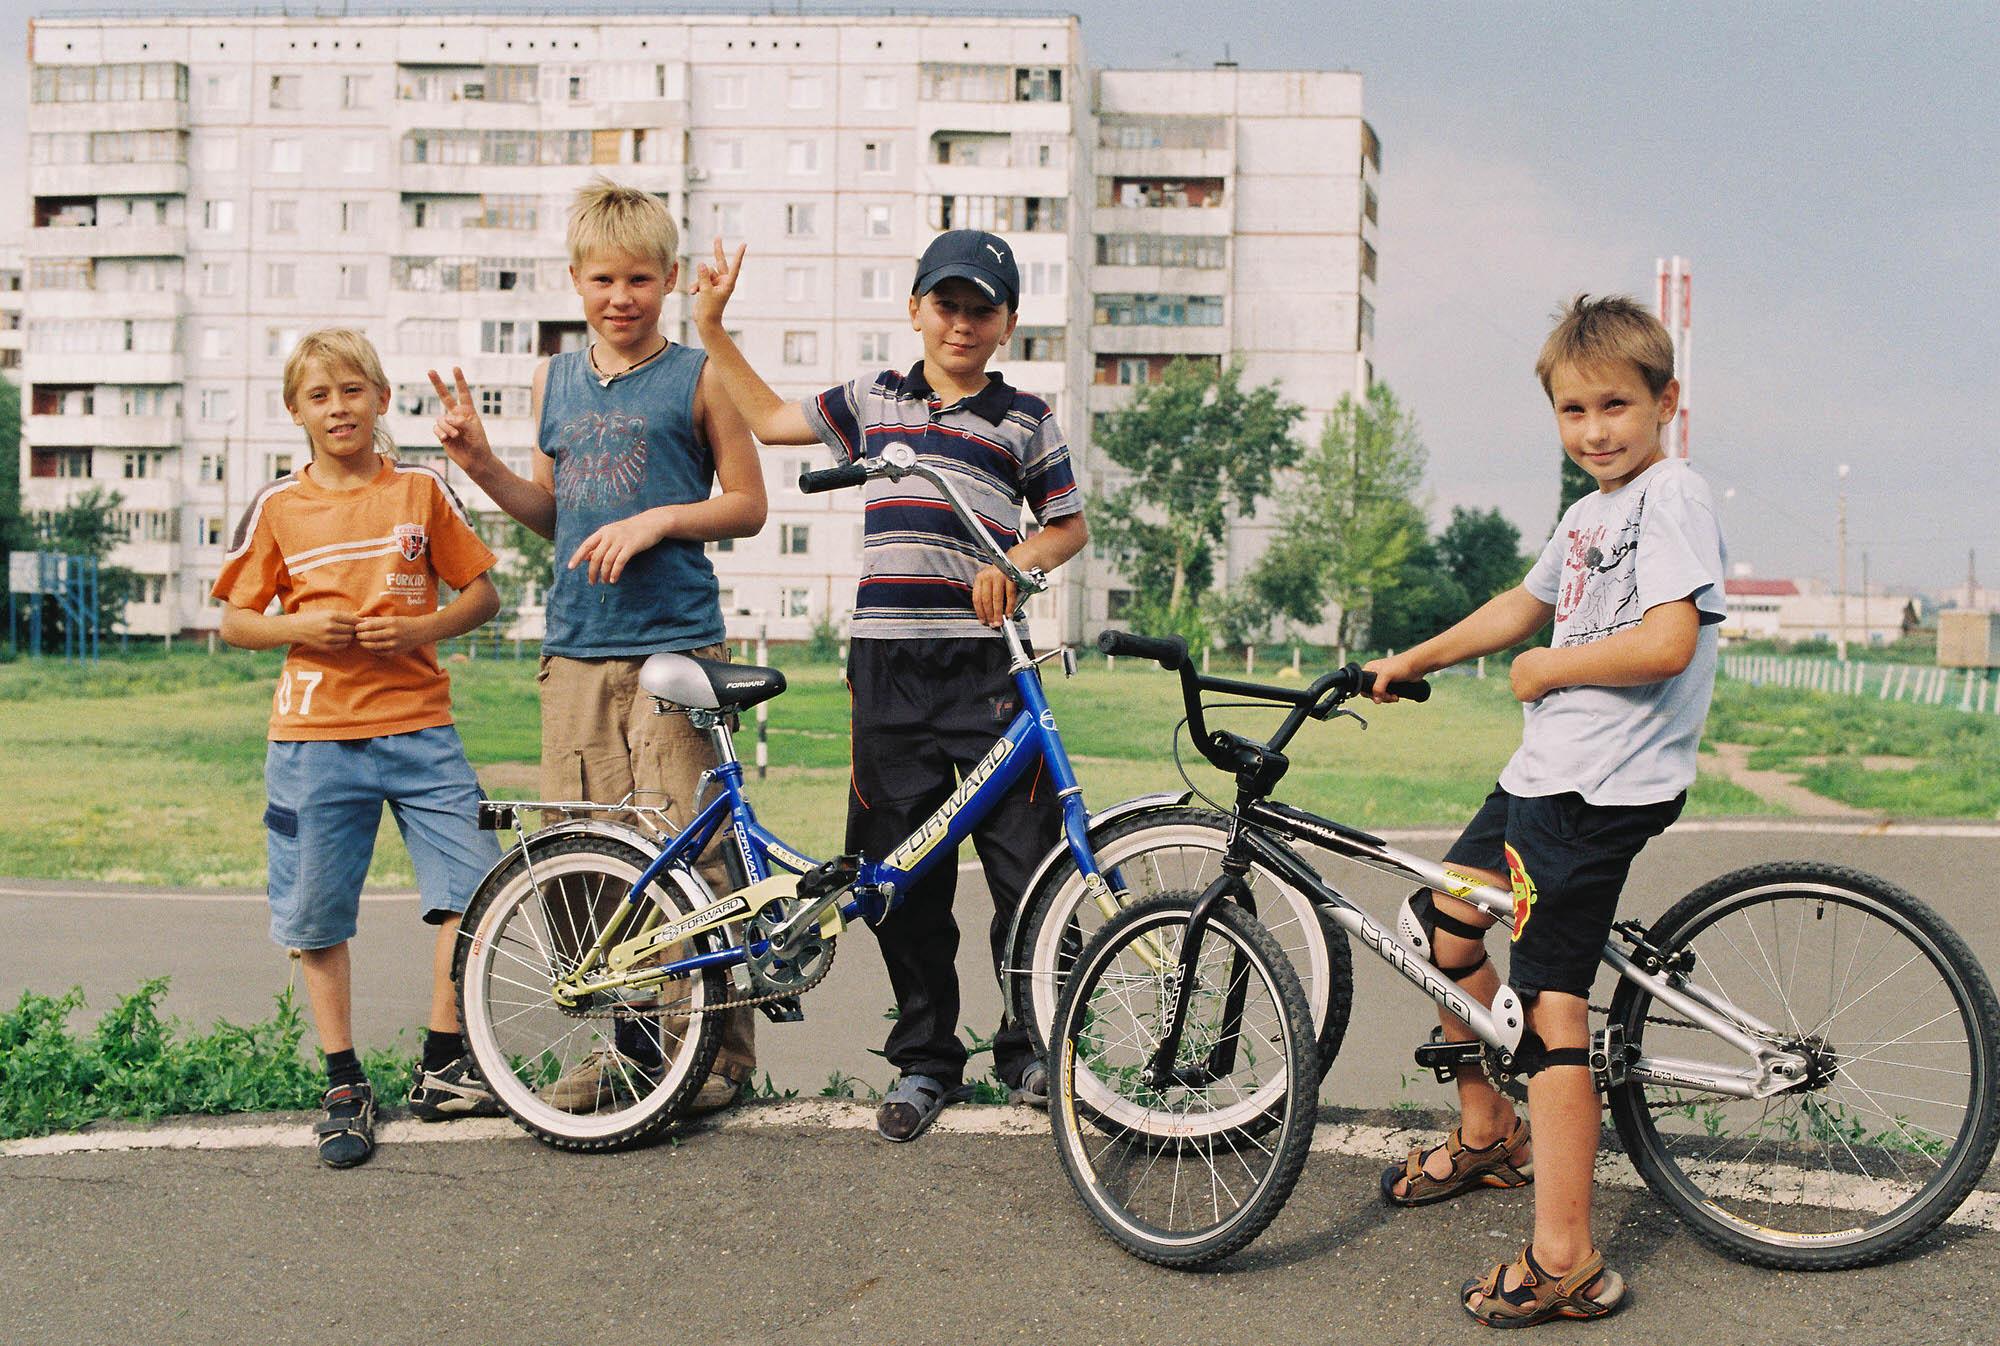 35mmPatrikWallner_Omsk_BikeKidsLOWQ